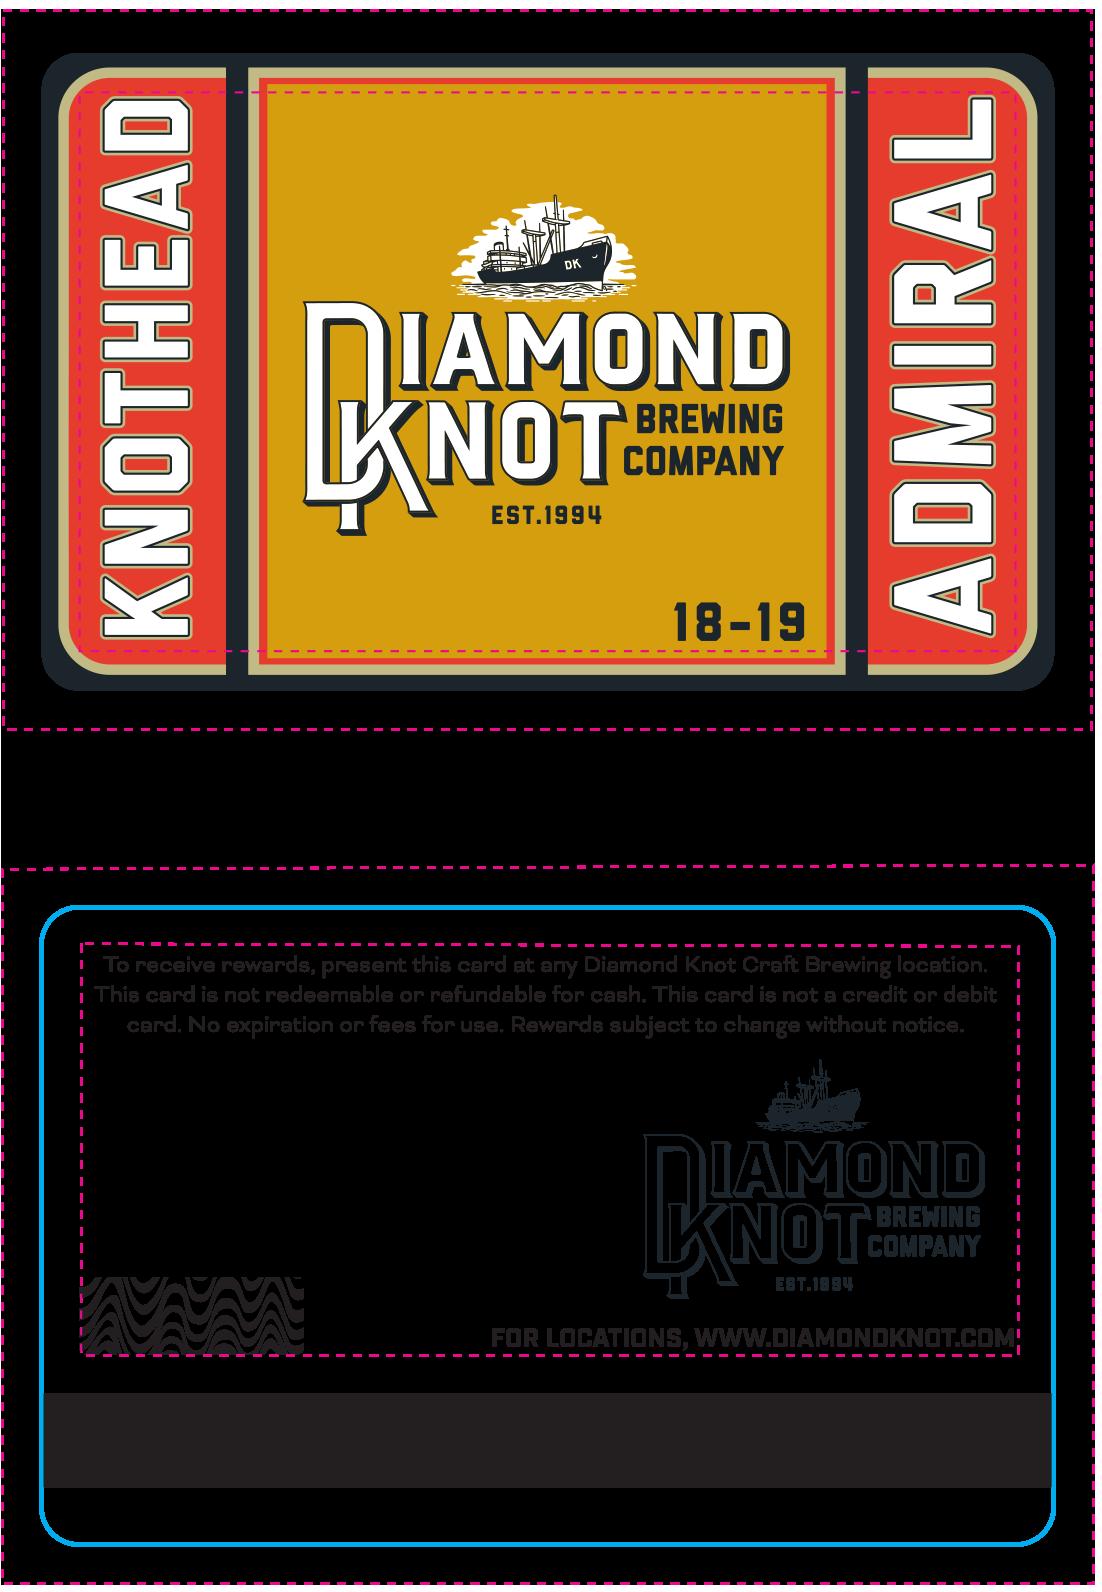 [DKB1834-H] Sales & Marketing Loyalty Cards -ADMIRAL-SPEC.png